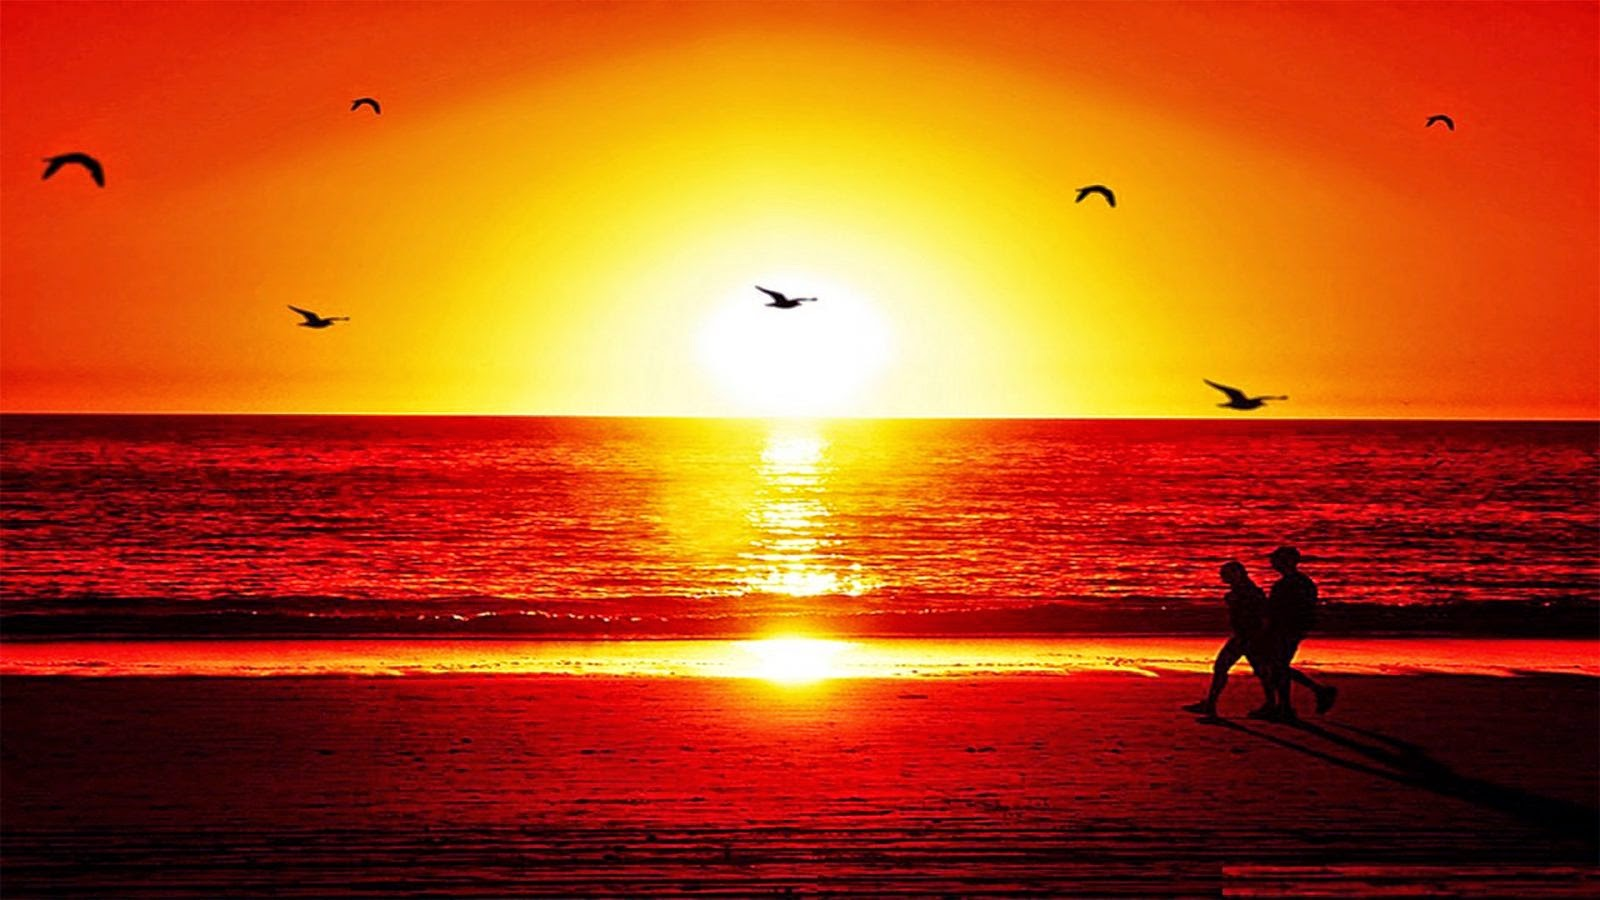 Chame a ELETROGUARD, porque o sol nasceu para todos...